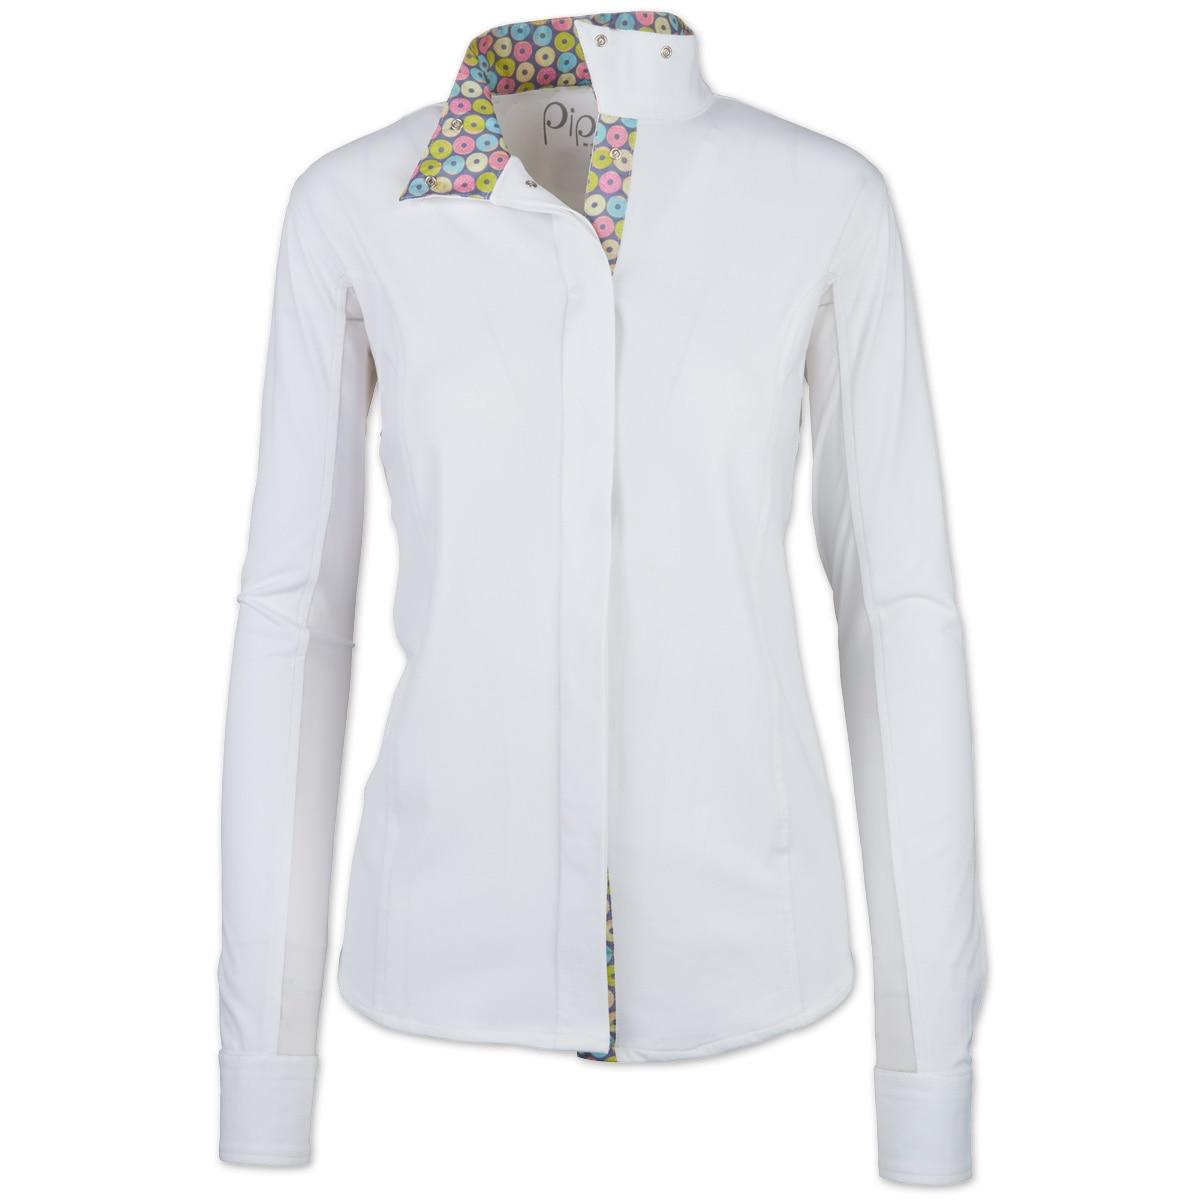 9eeebb32b Piper Long Sleeve Show Shirt by SmartPak